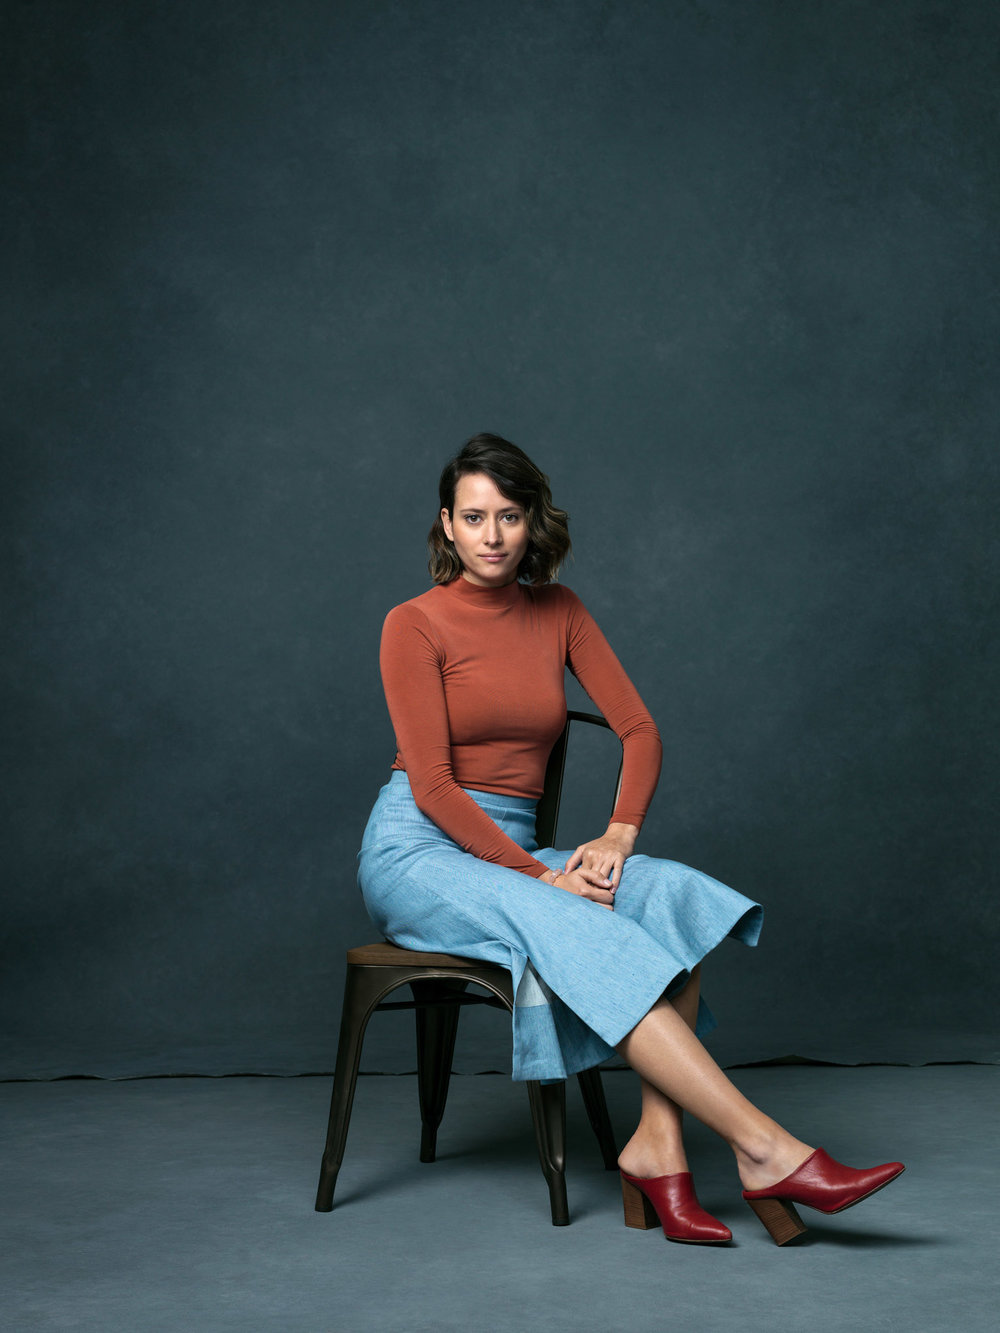 The Principles of Design Woman - Estefania De Ros in the Sway Cropped Pant.